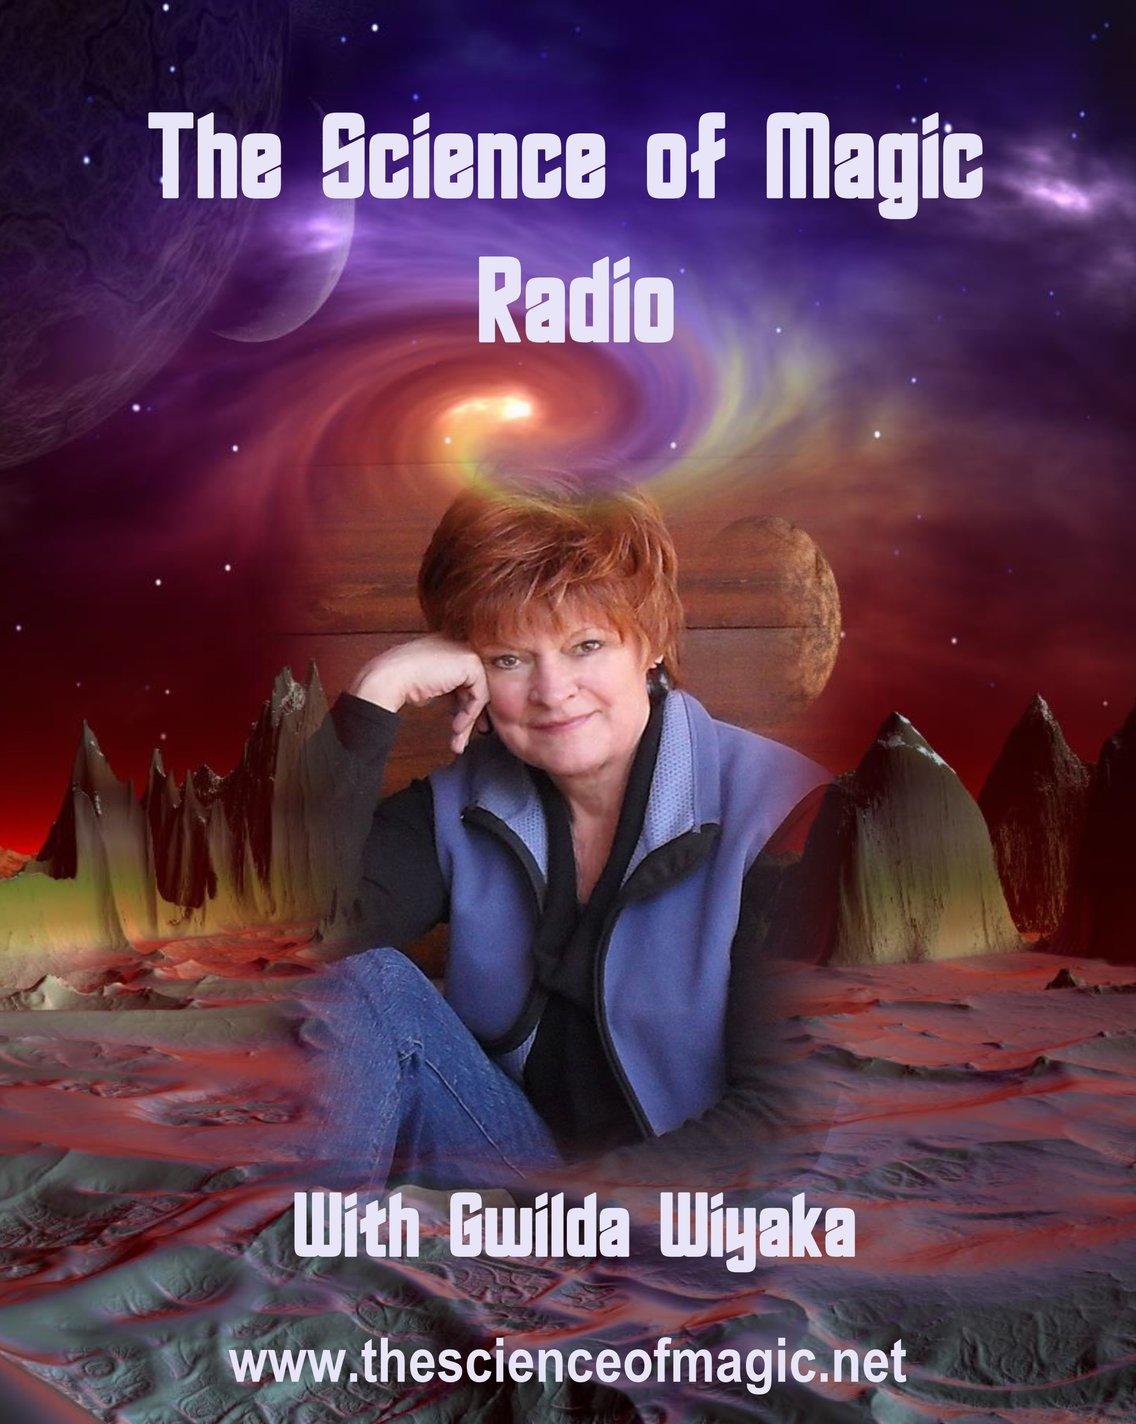 The Science of Magic with Gwilda Wiyaka - imagen de portada